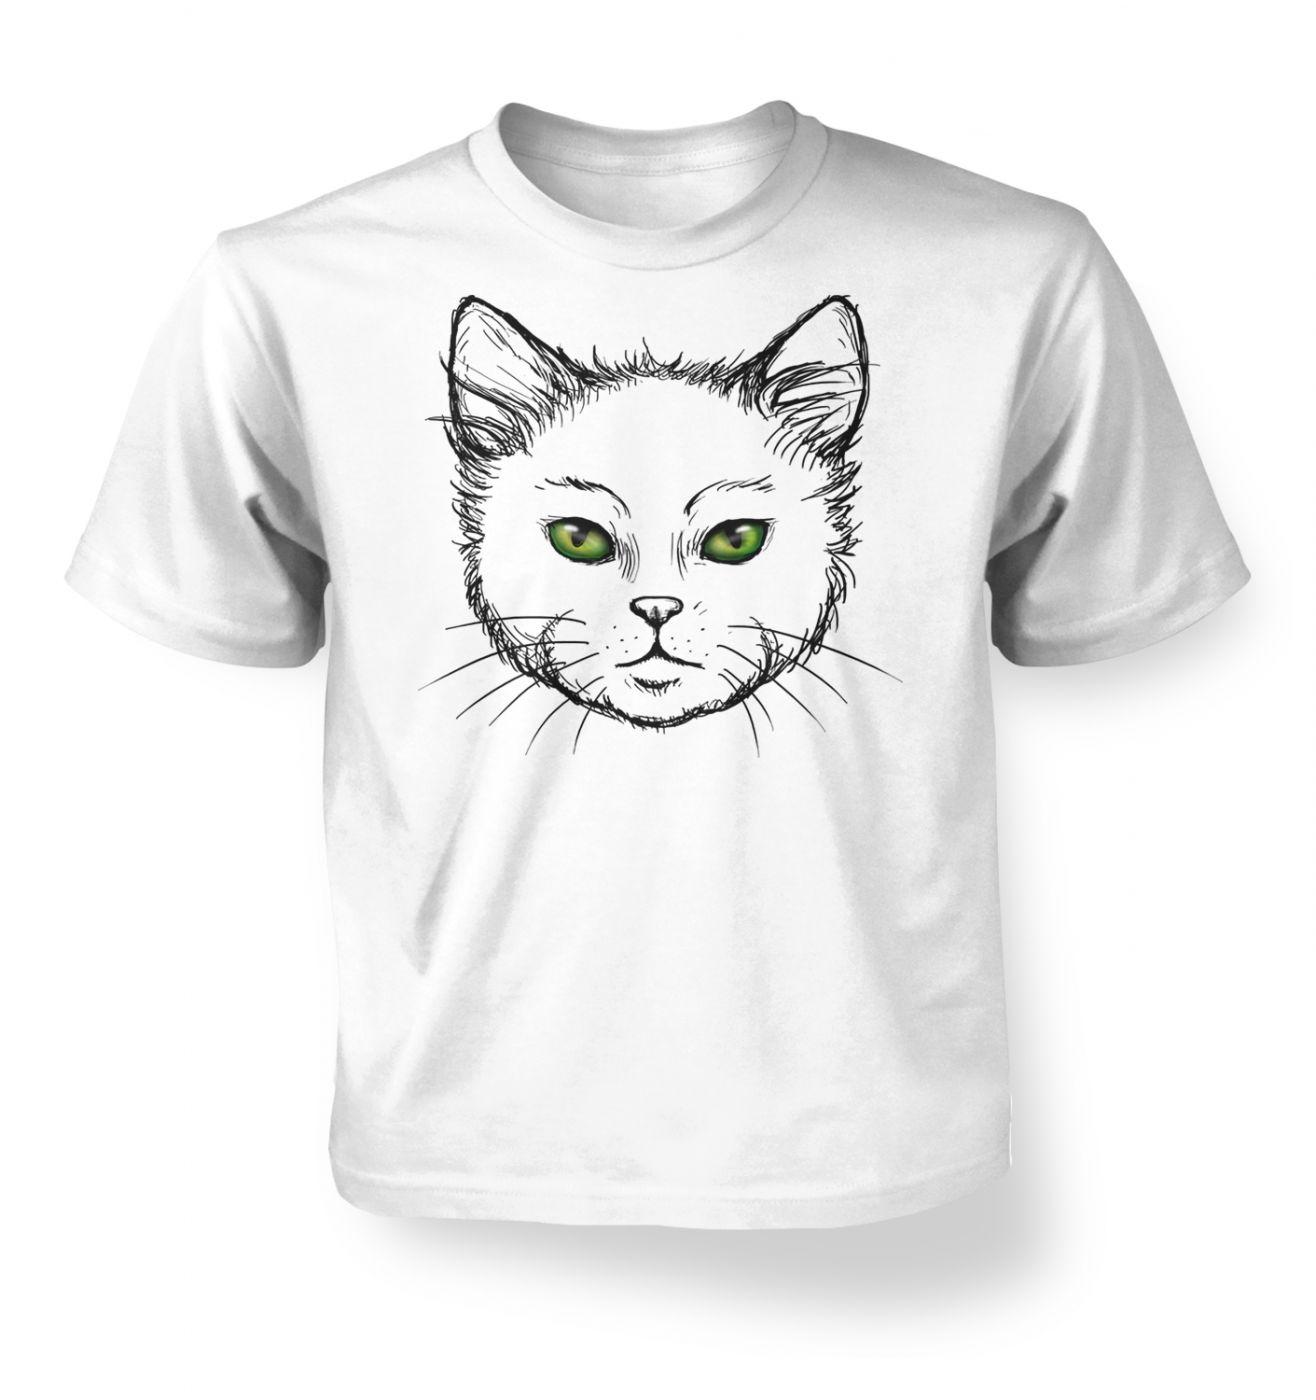 Eyes Of The Cat kids t-shirt (white) - Cute cat kids tshirt